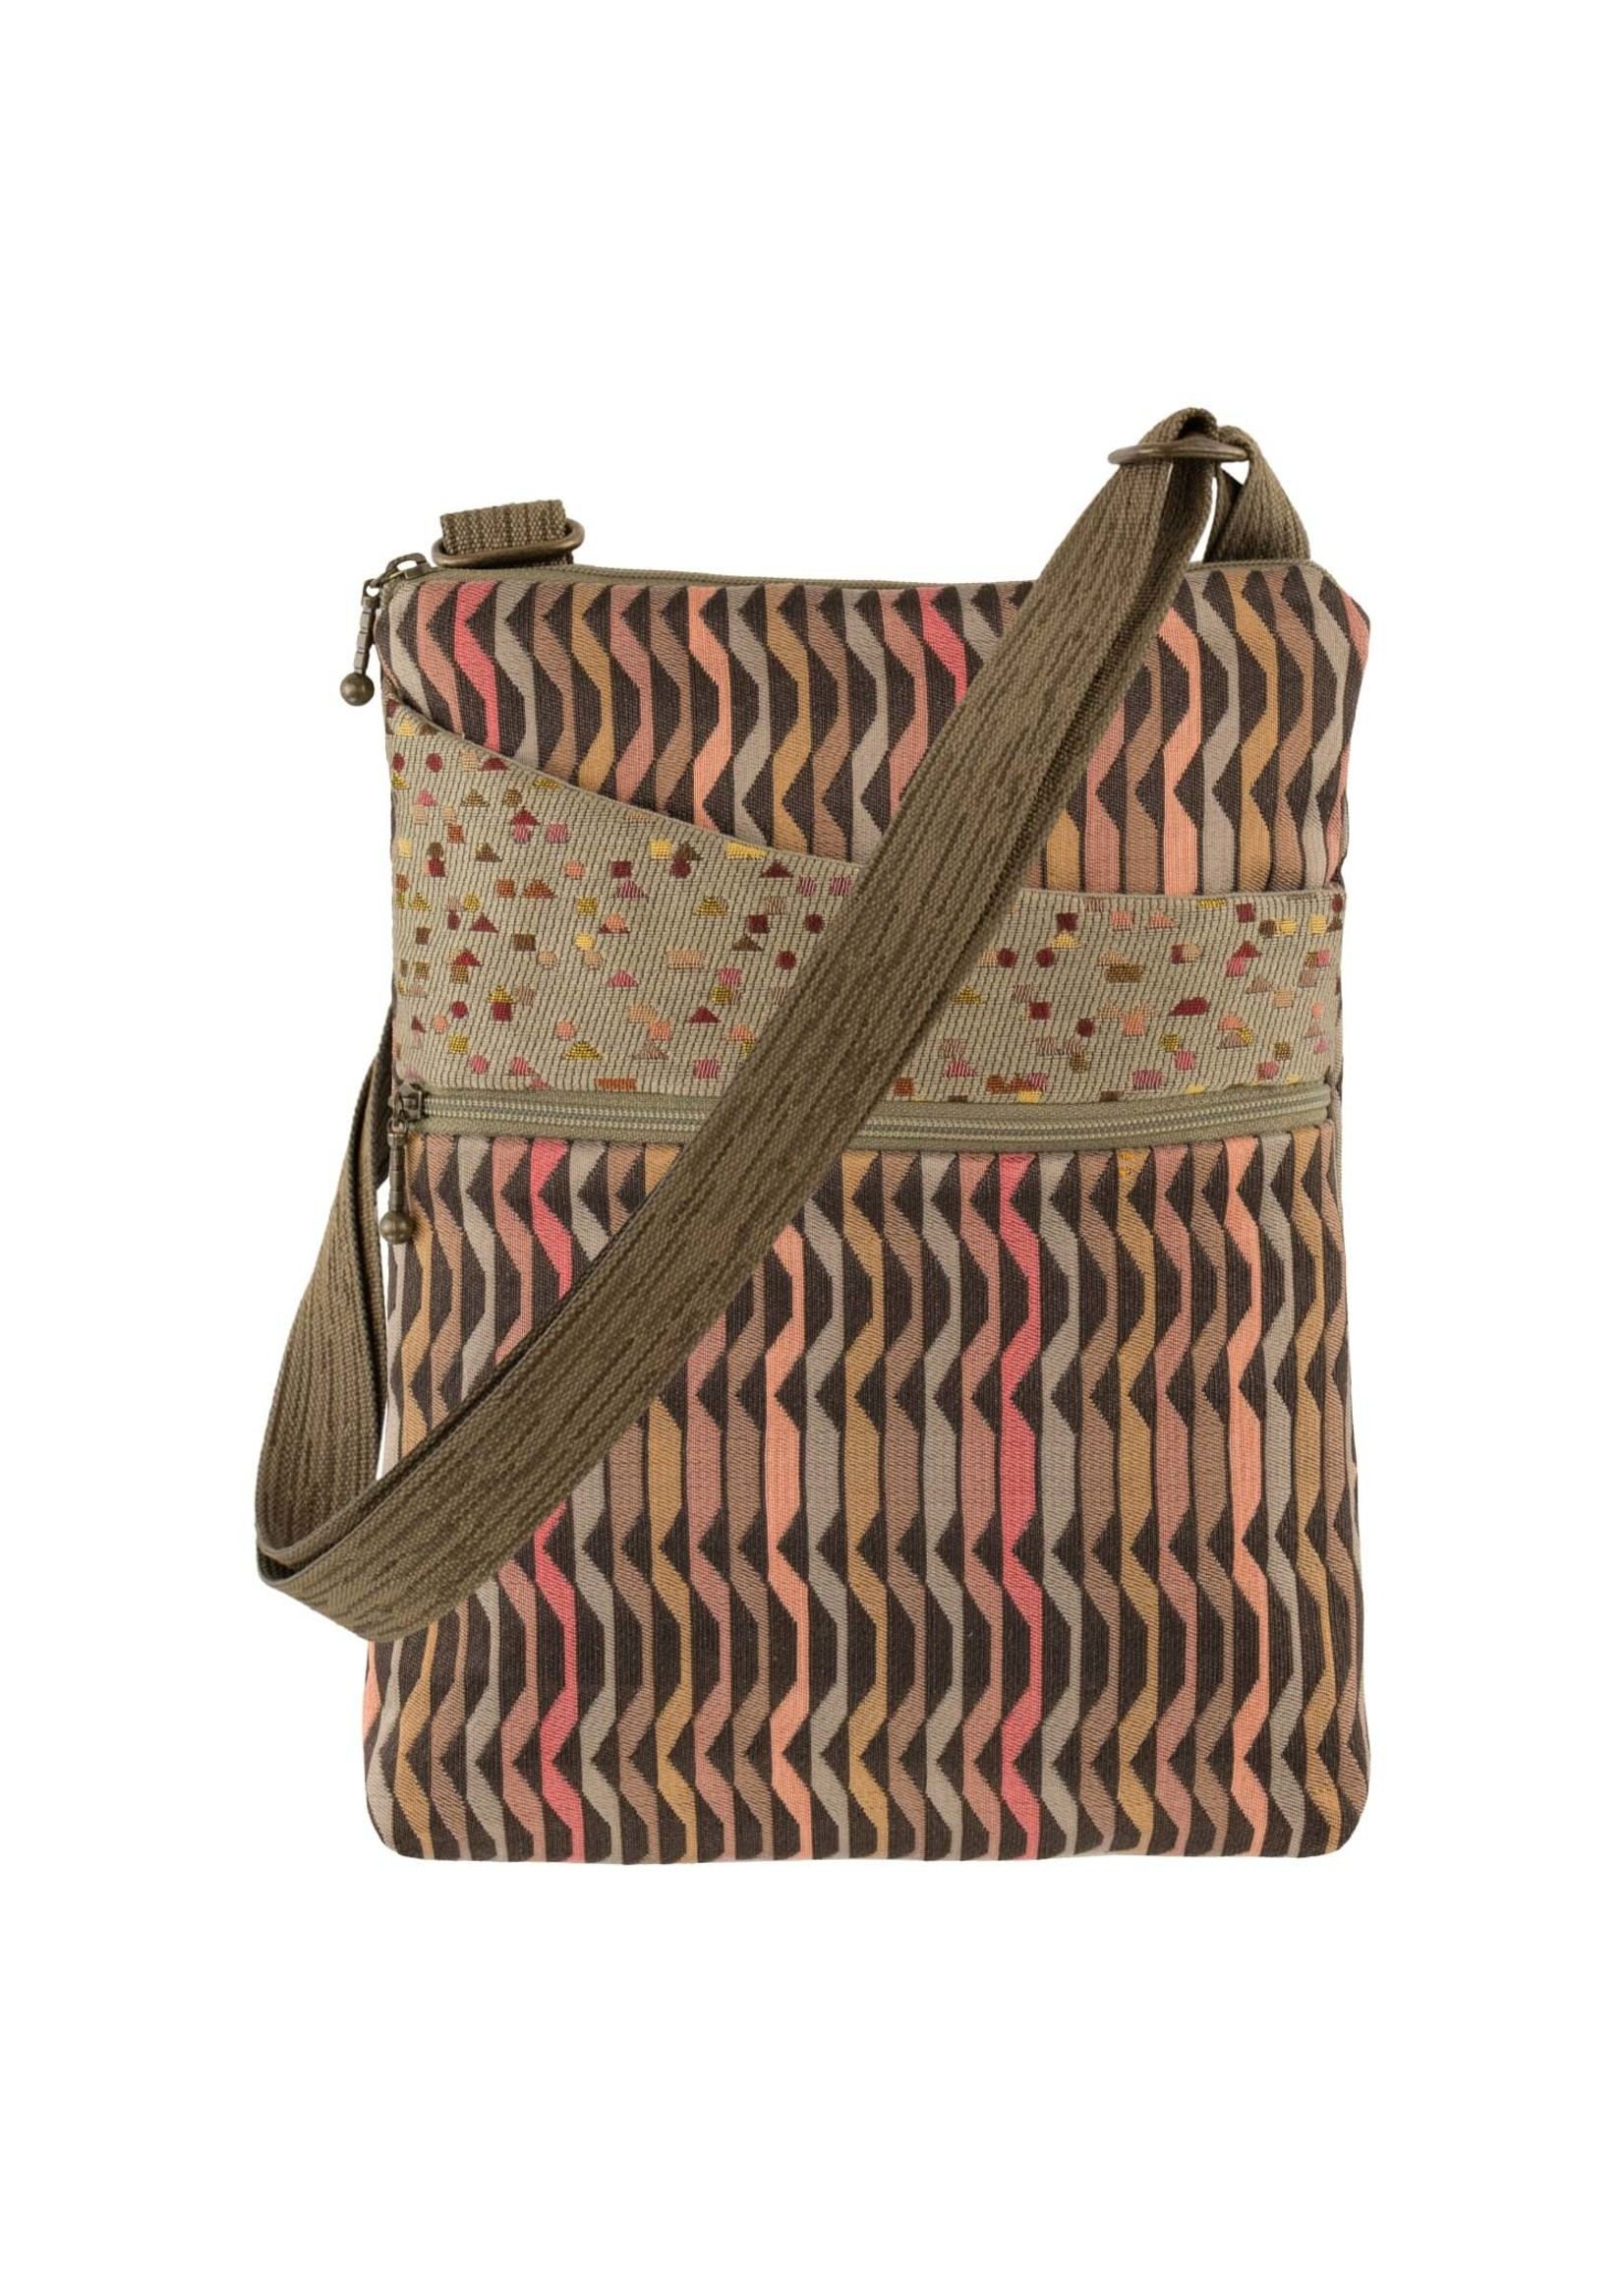 Maruca Pocket Bag SS21 Kites